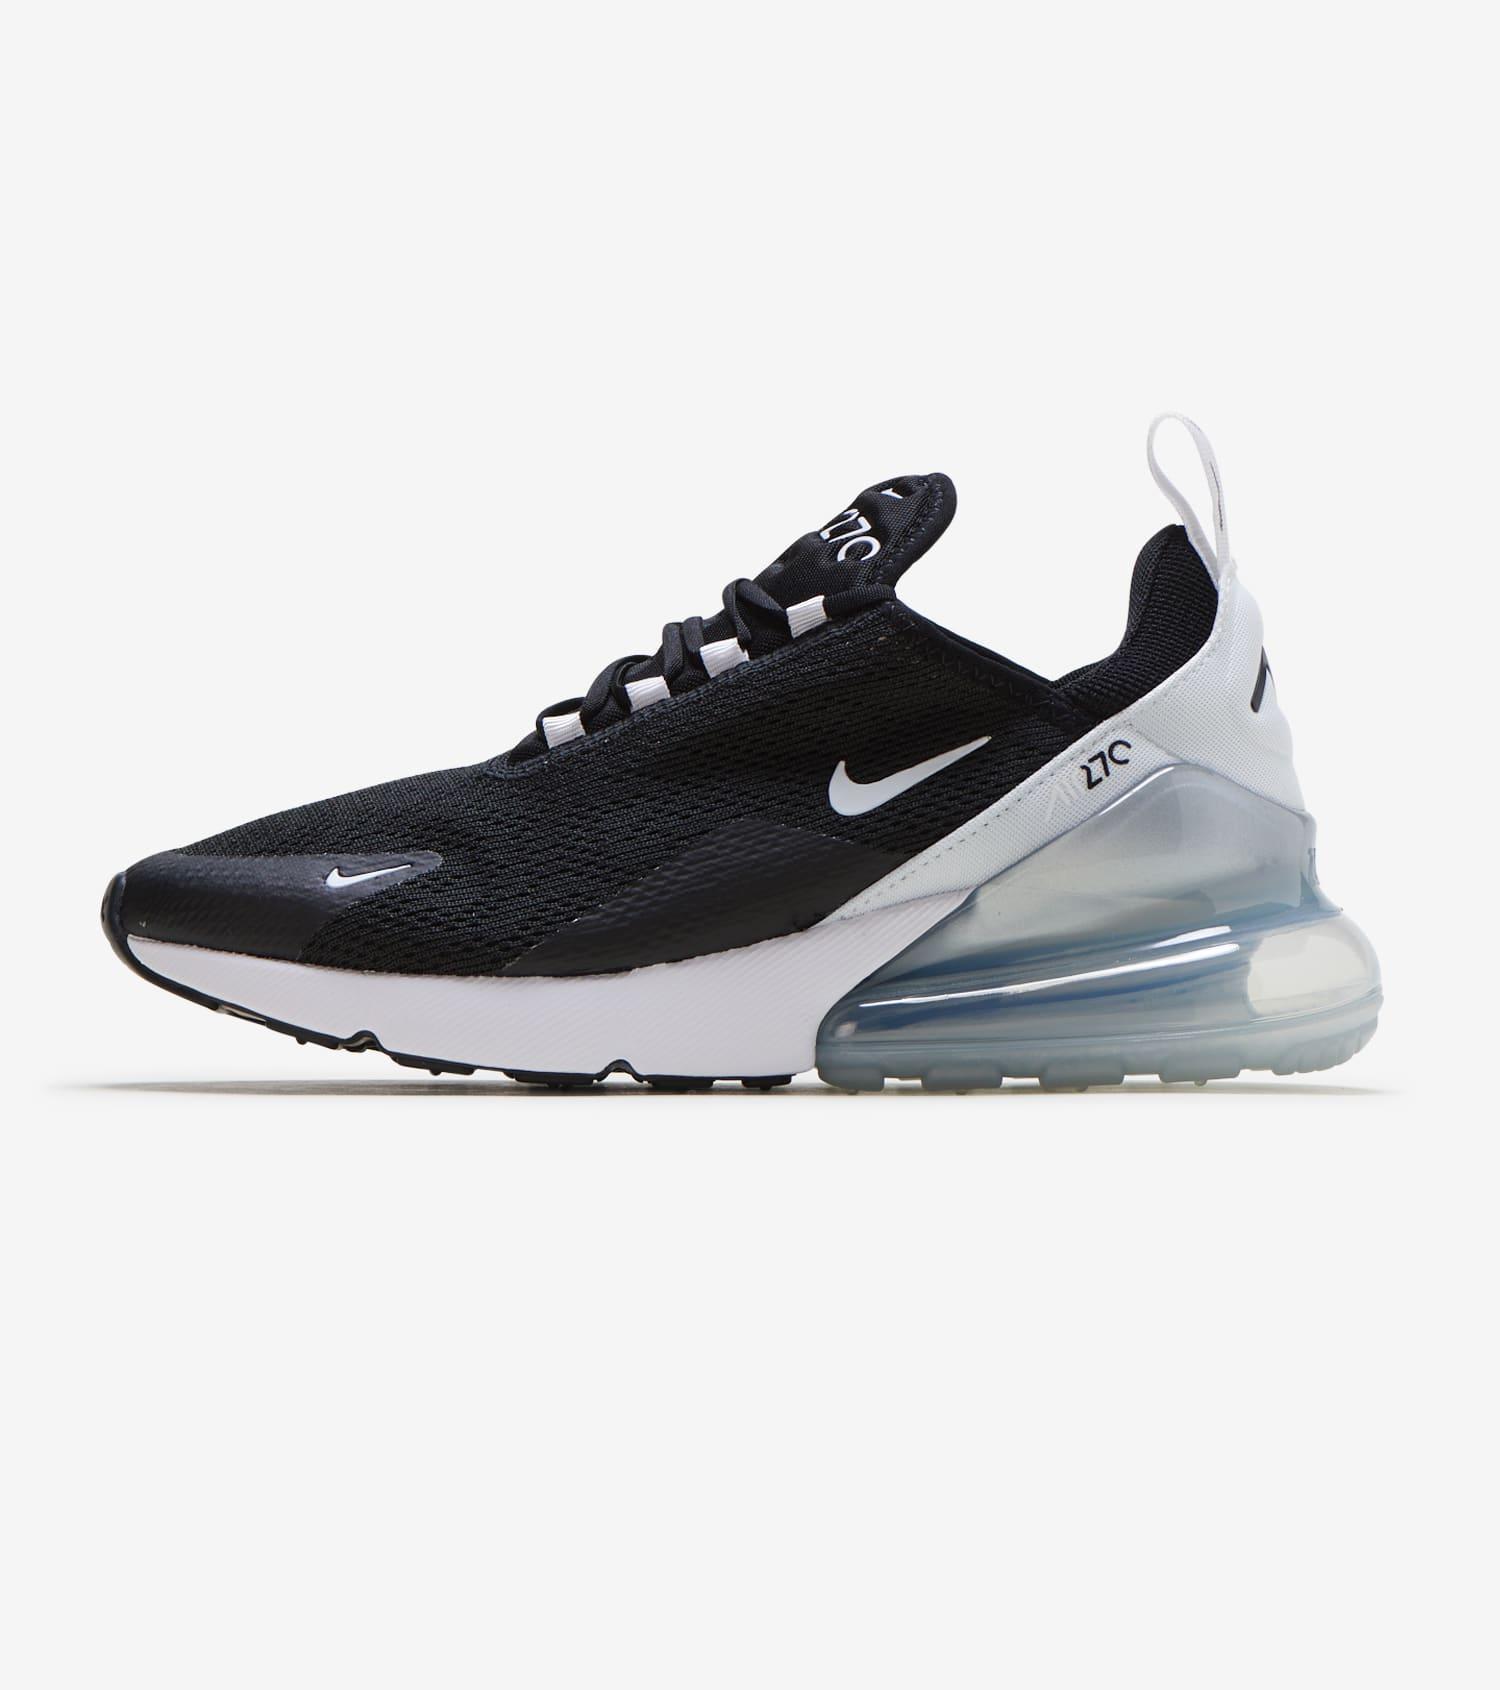 Nike Air Max 270 (White) AH6789 107   Jimmy Jazz